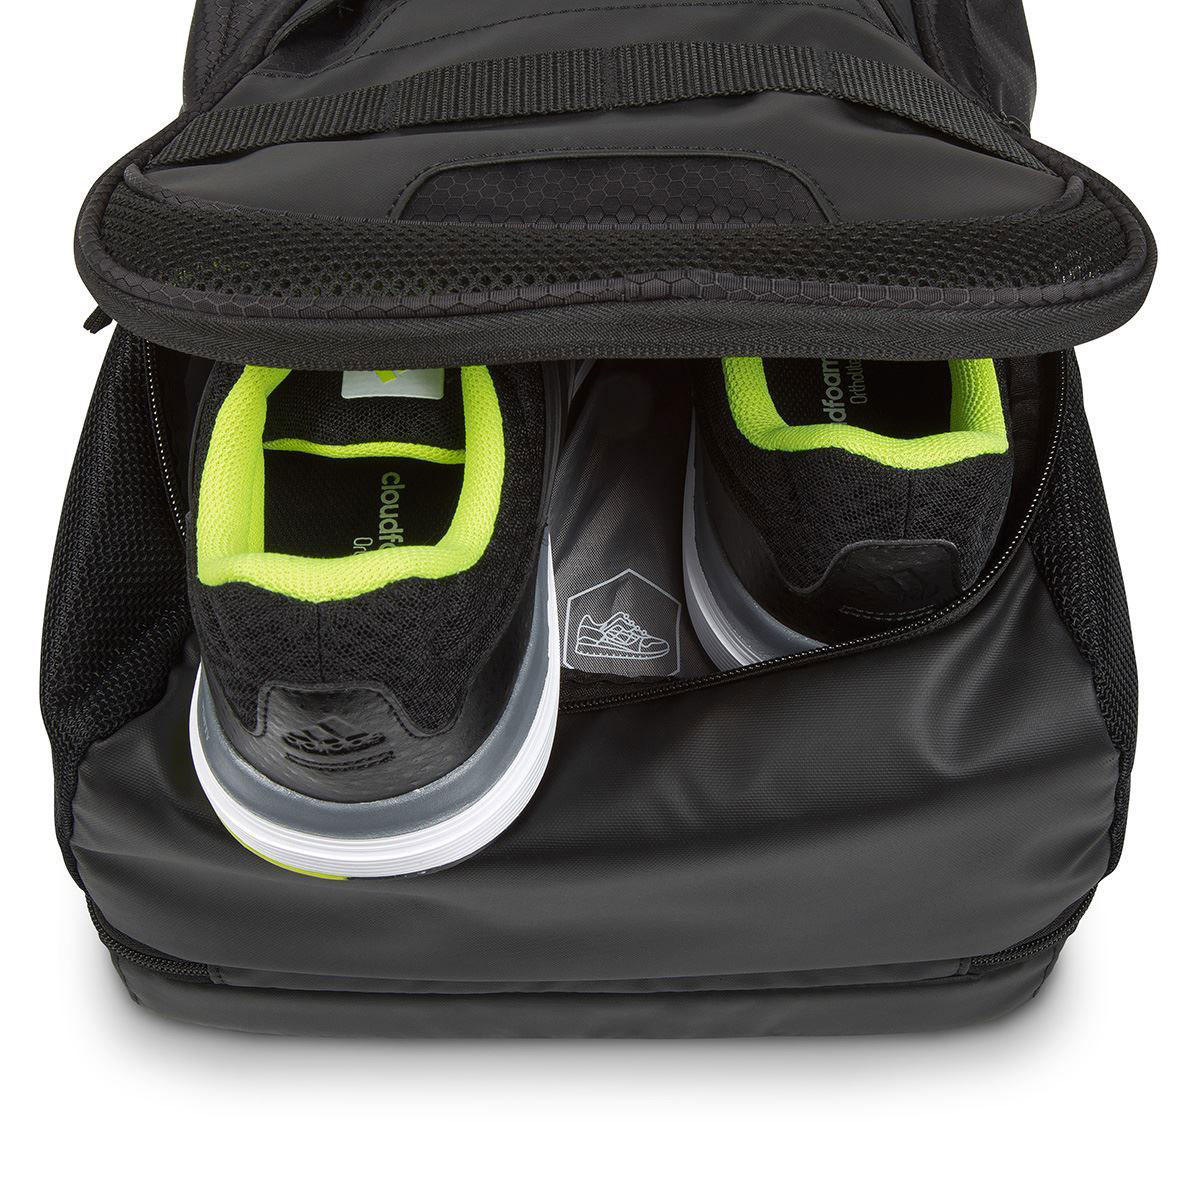 "TSB944EU Stamina 15.6"" Laptop Backpack Targus - Sac et sacoche - 1"